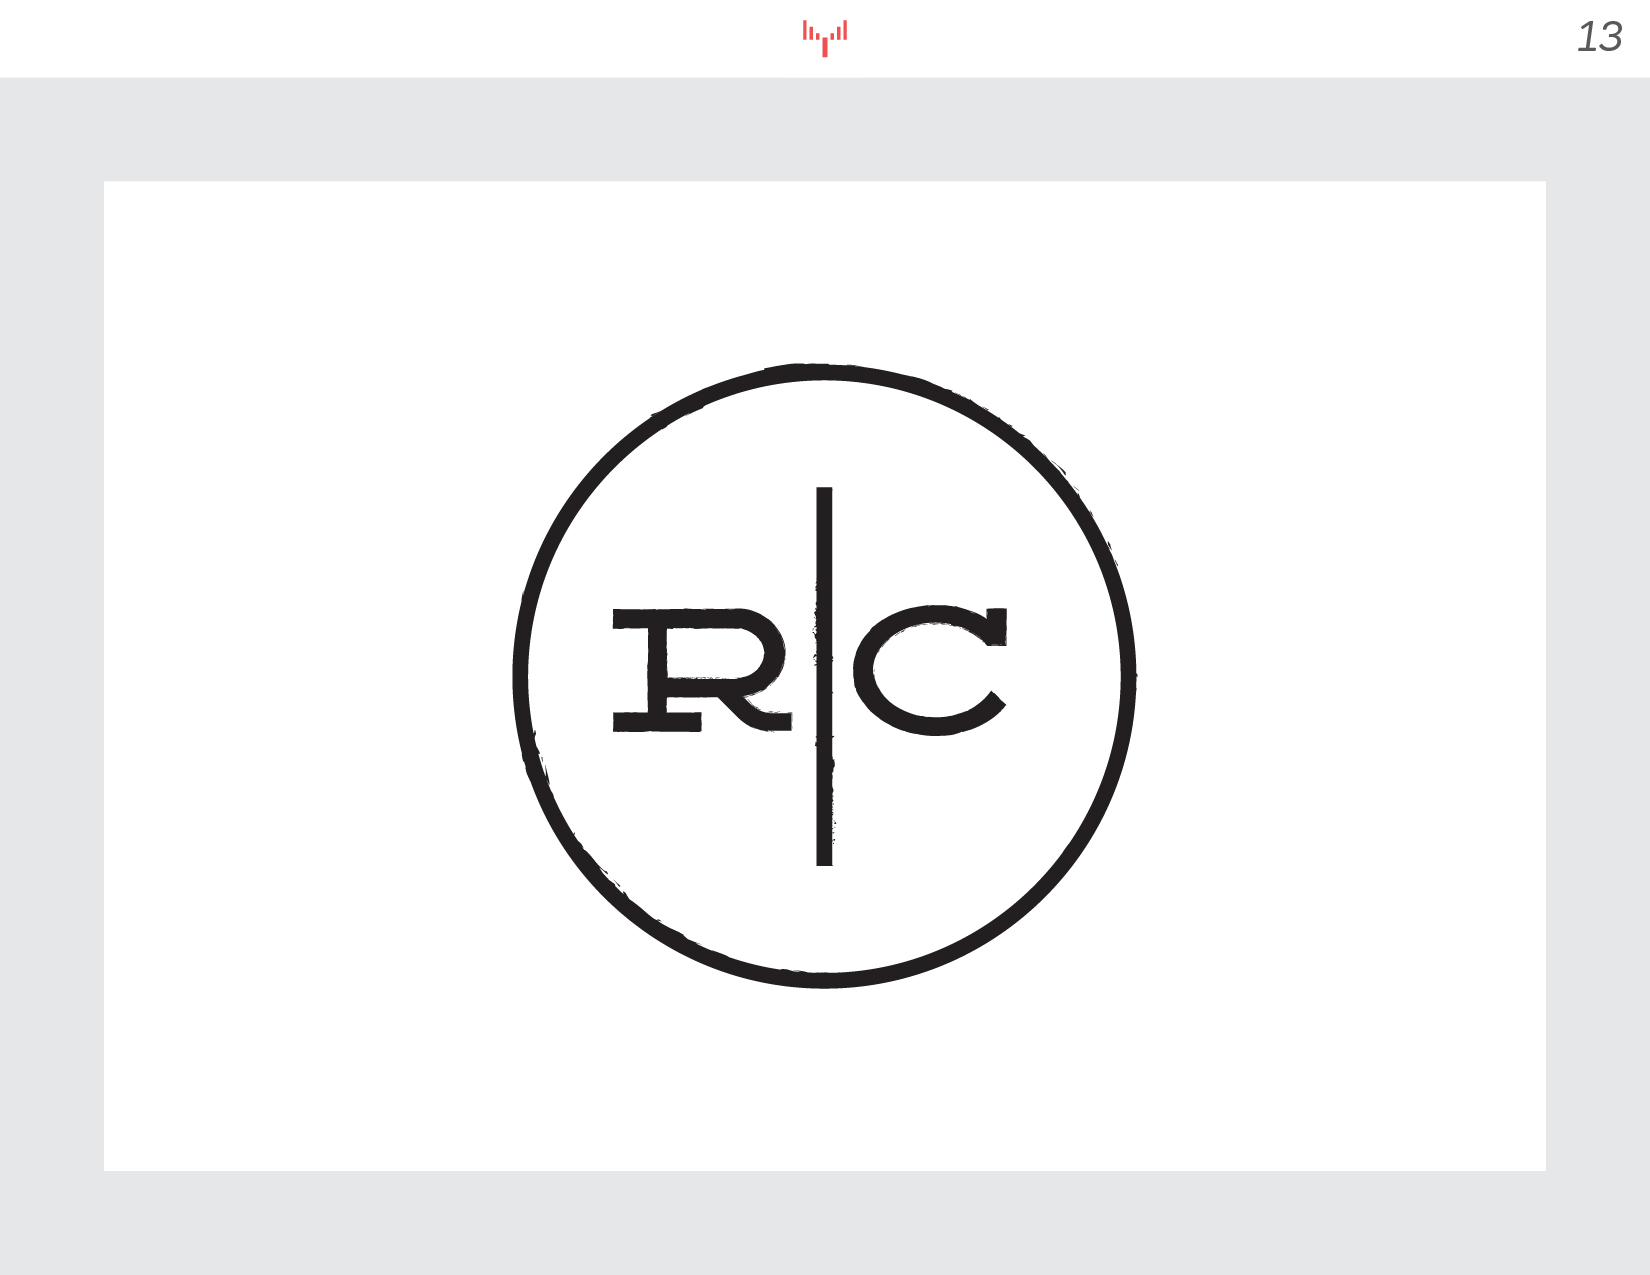 RC_V1-13.jpg